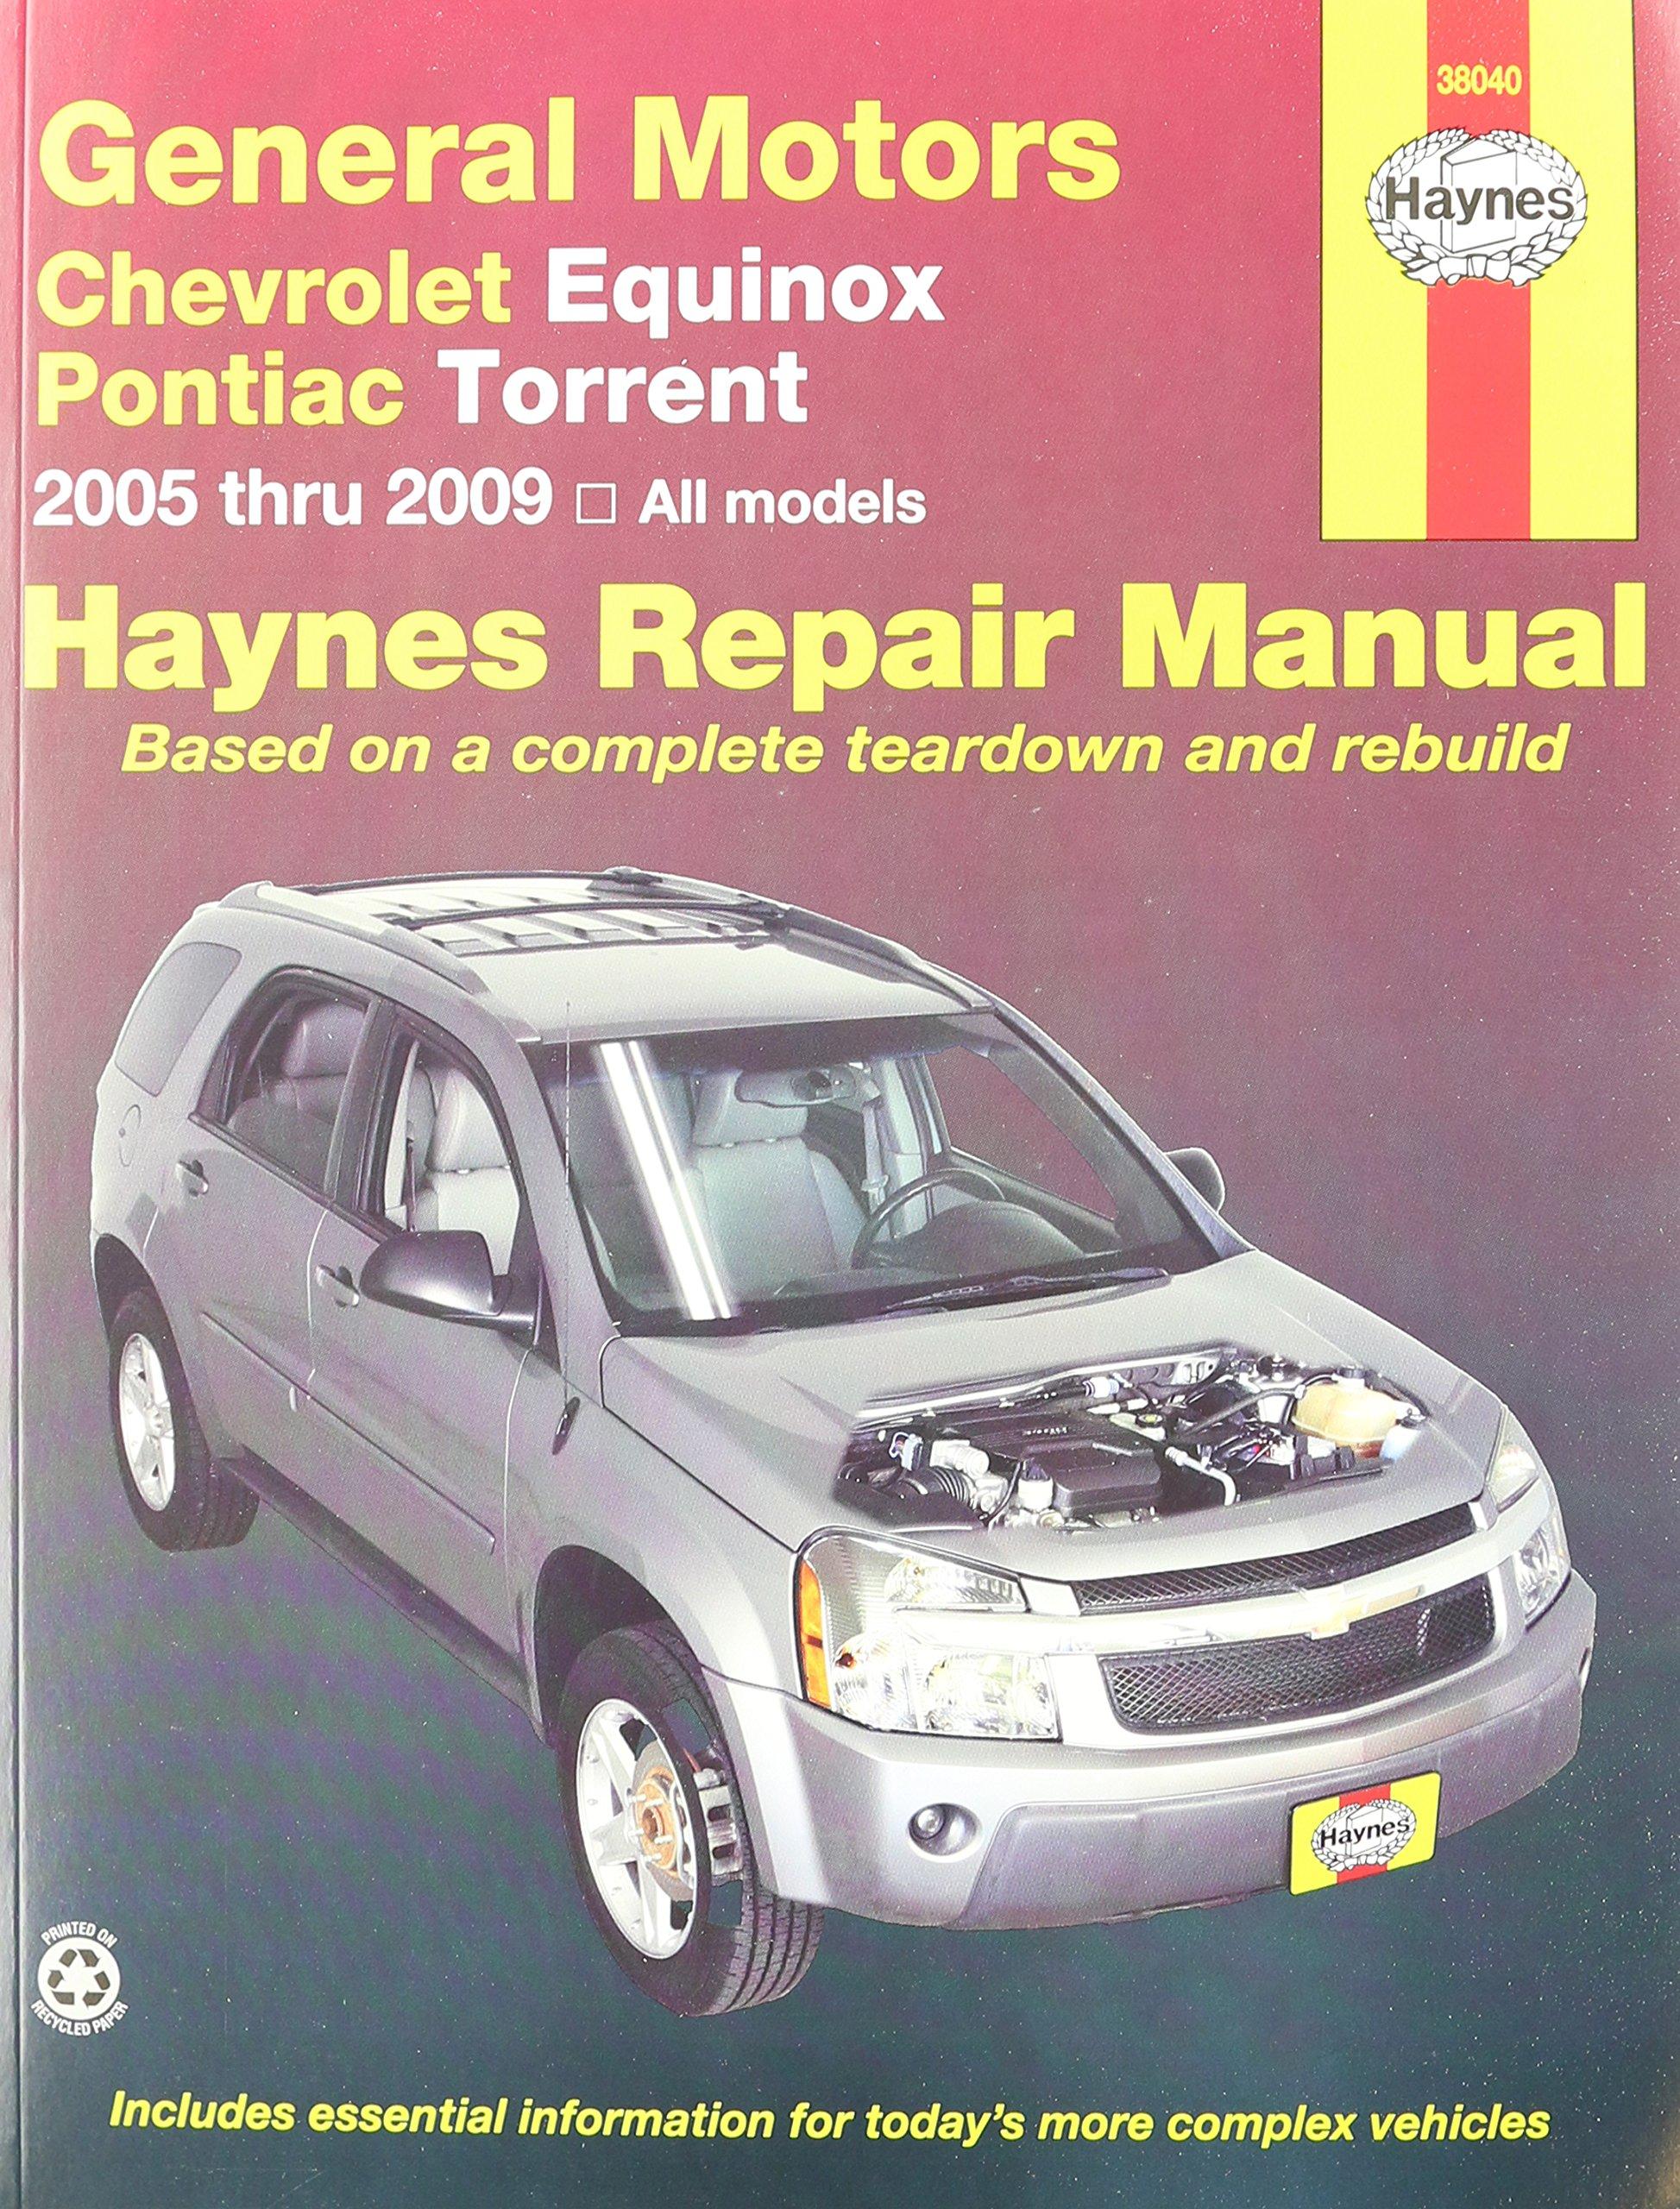 Chevrolet Equinox Automotive Repair Manual: 05-09 (Haynes Automotive Repair  Manuals): Amazon.co.uk: Tim Imhoff: 9781563928000: Books